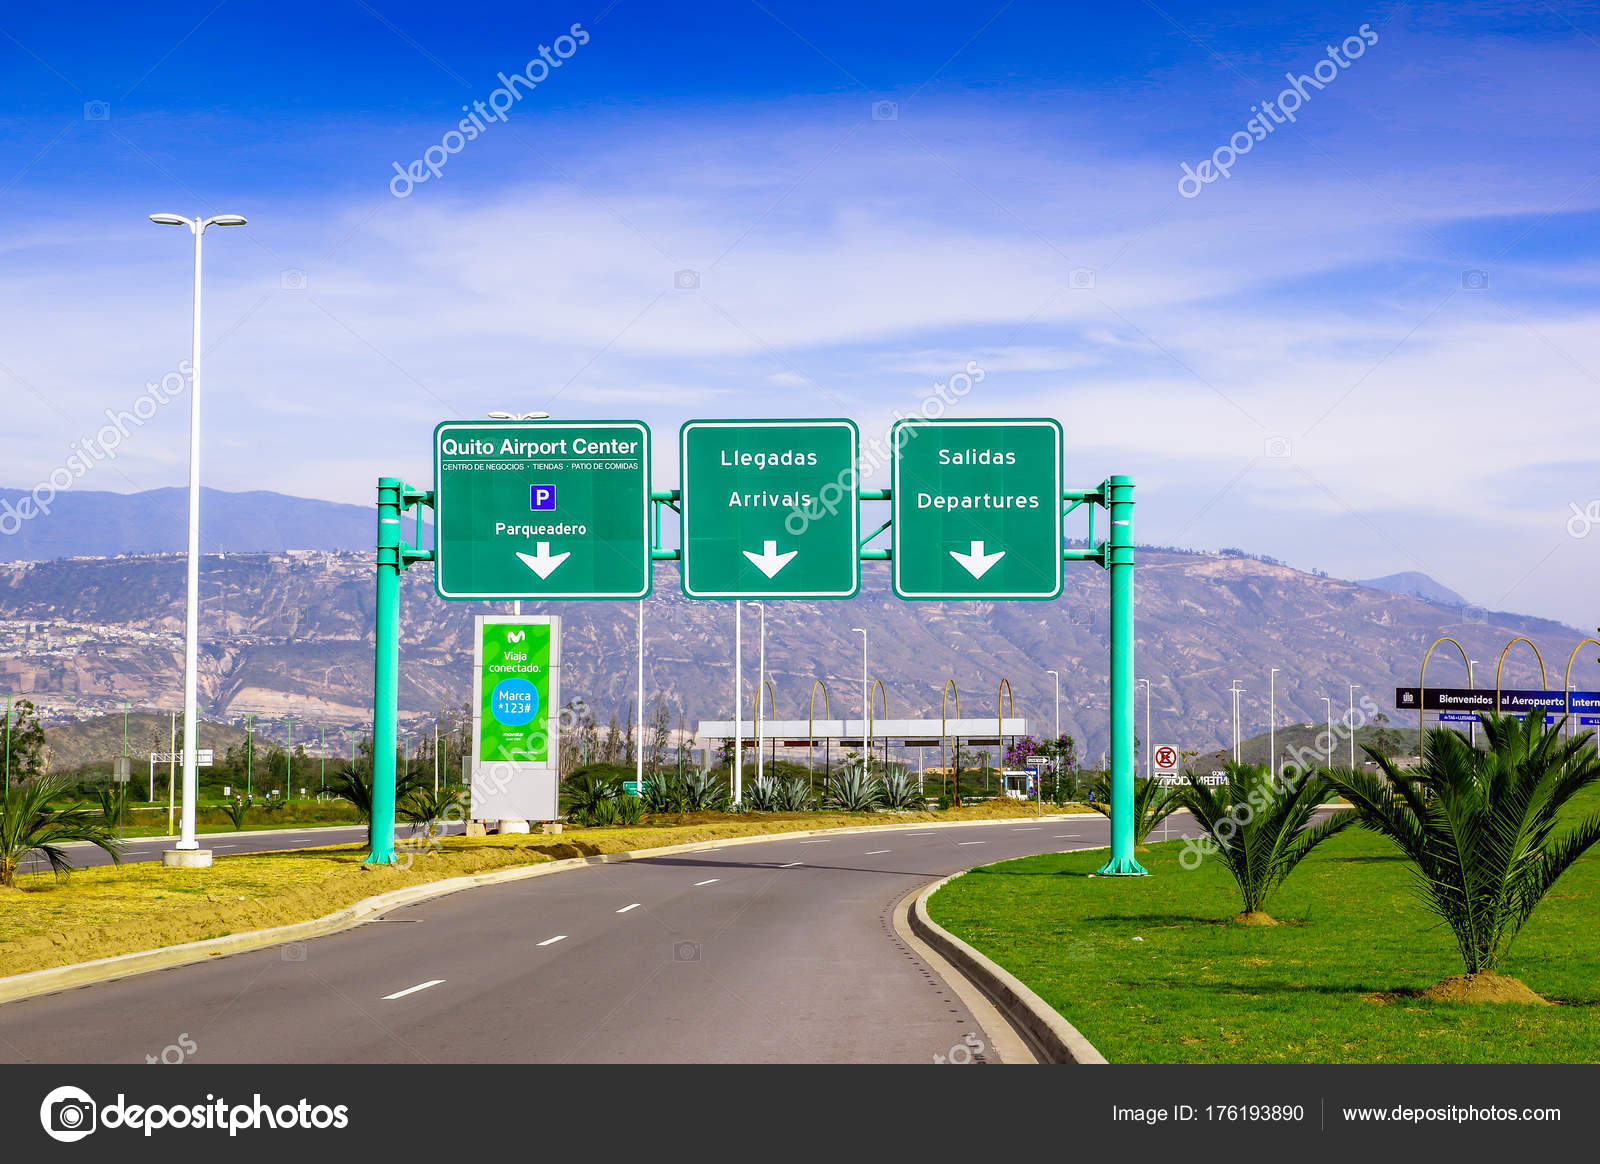 Quito, Ecuador - November 23 2017: Informative sign of Quito airport